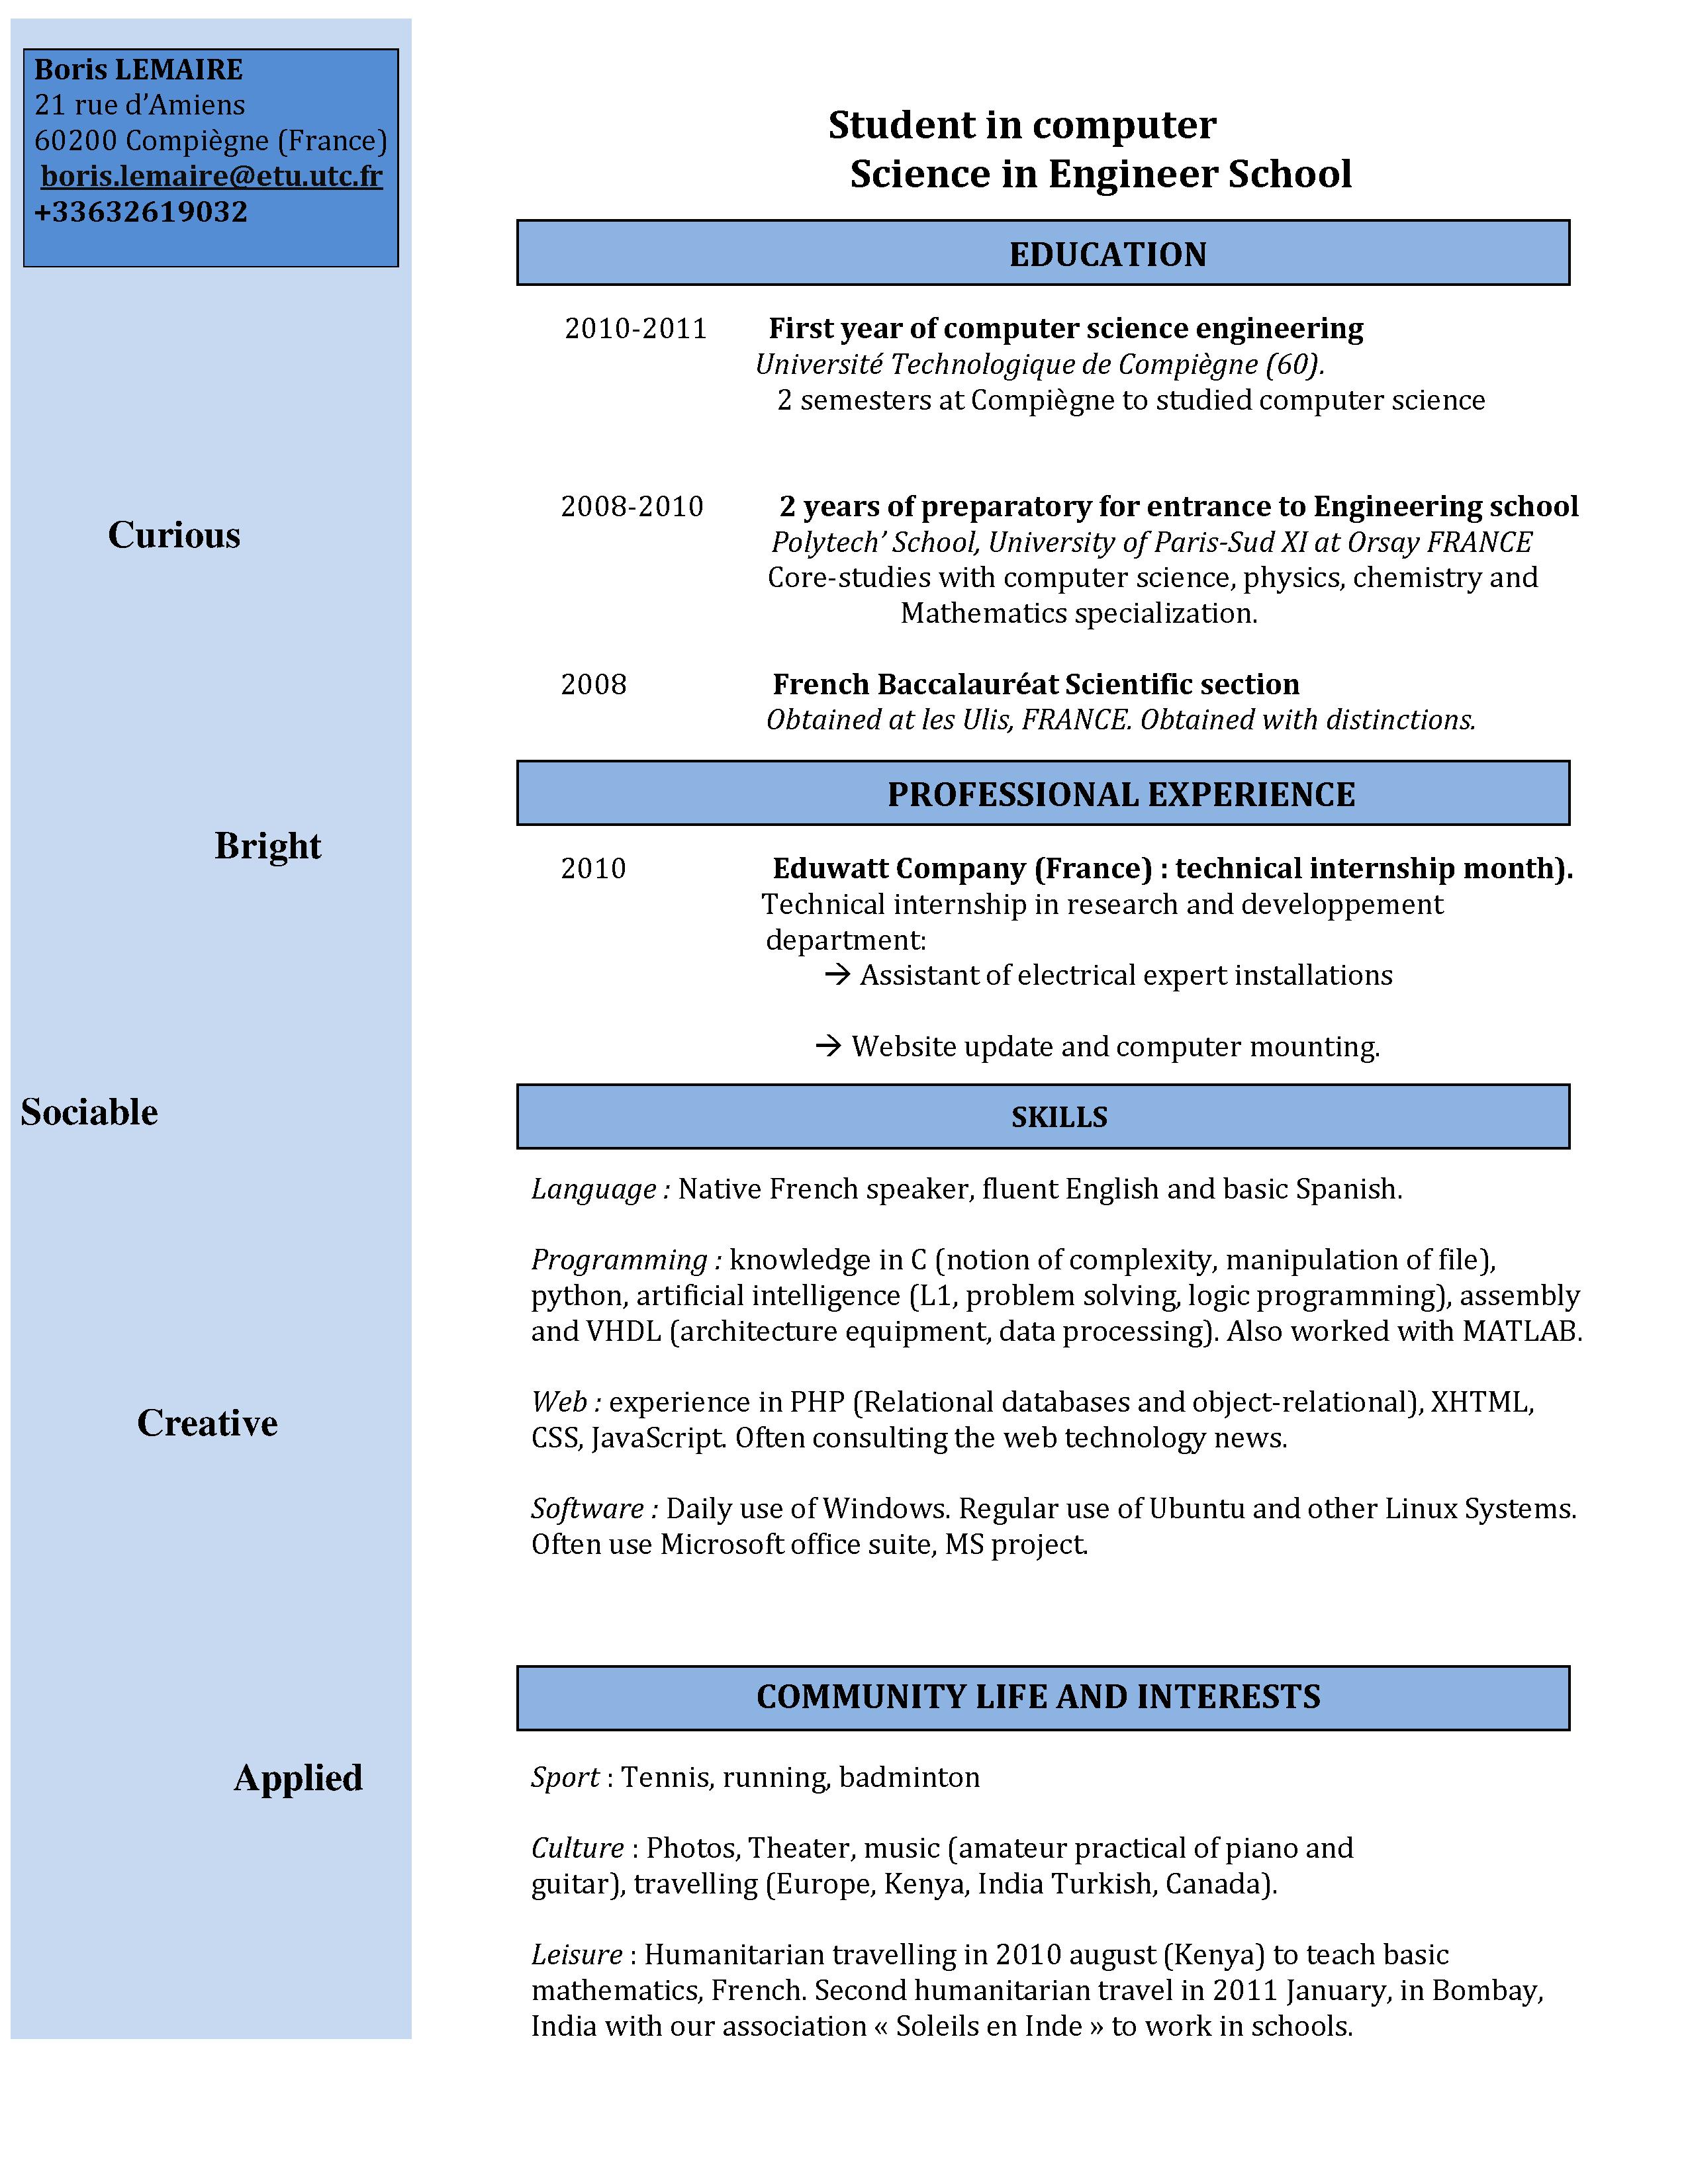 resume format  cv presentation publication